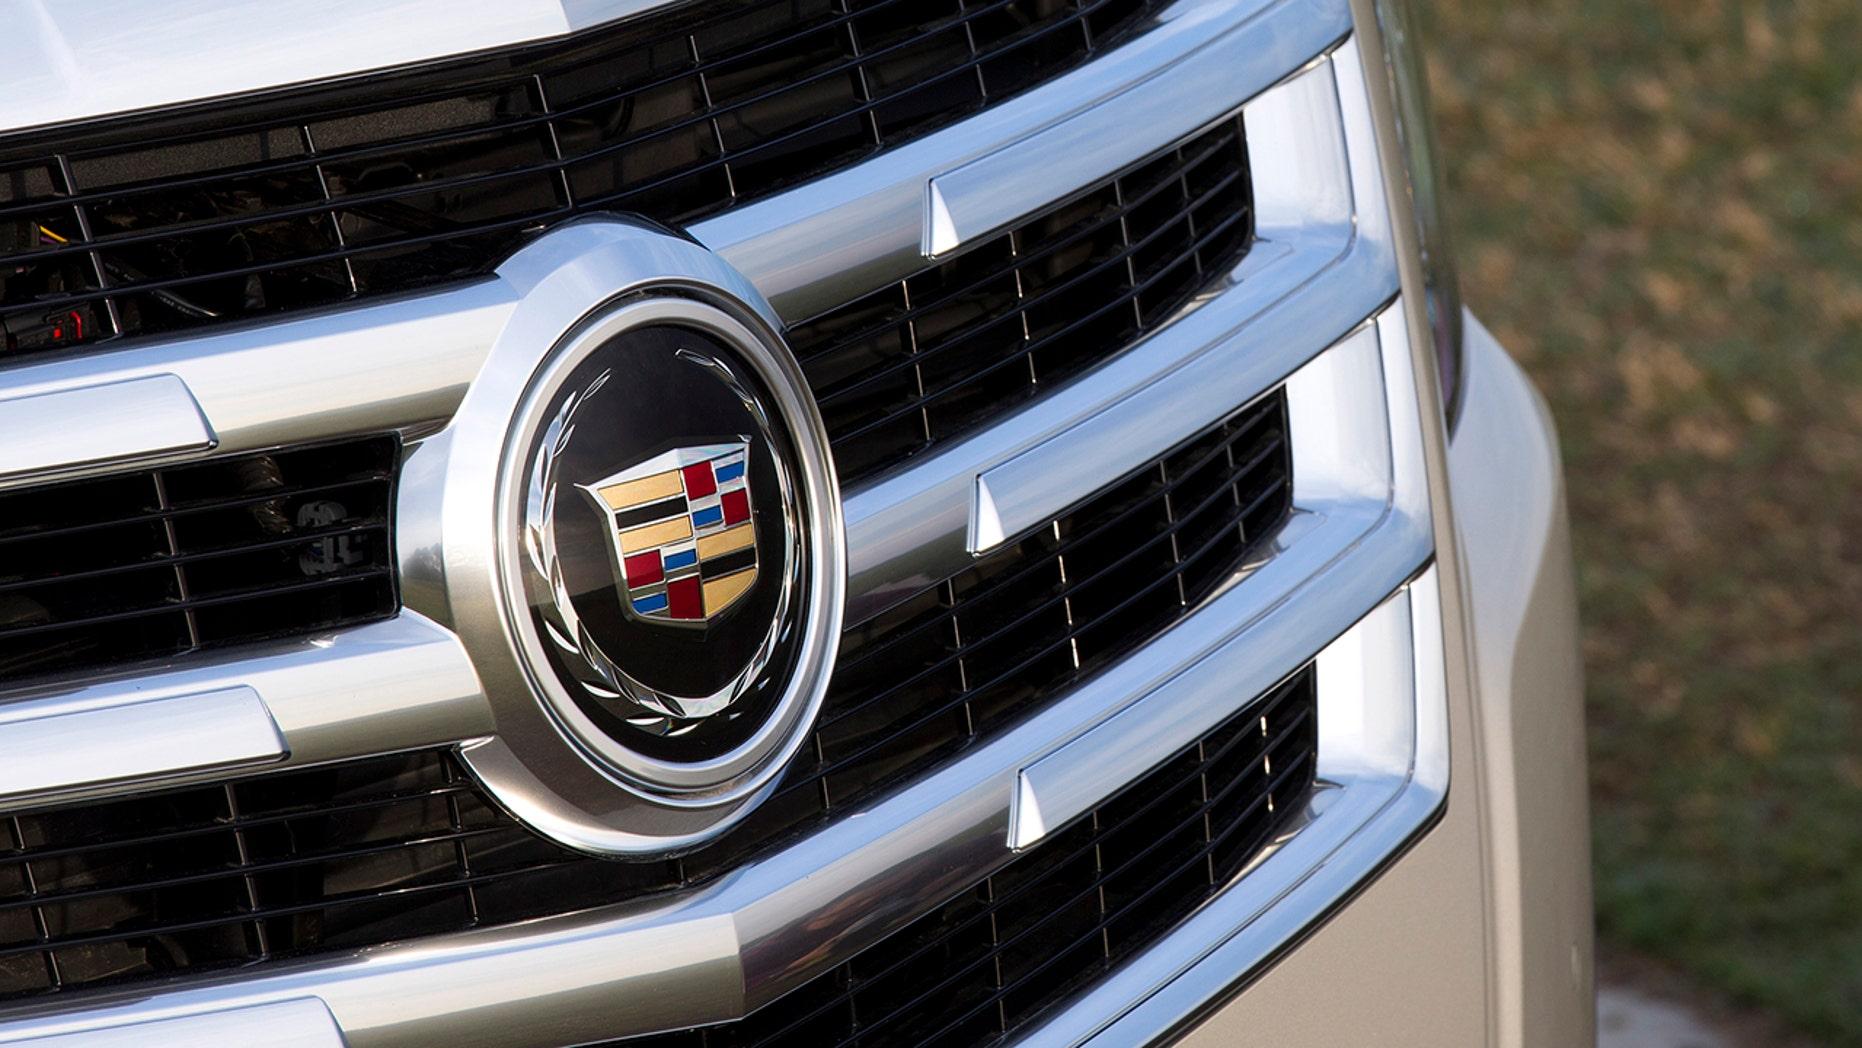 Cadillac mulai menghapus puncaknya yang dibungkus karangan bunga laurel pada tahun 2014. (Cadillac)